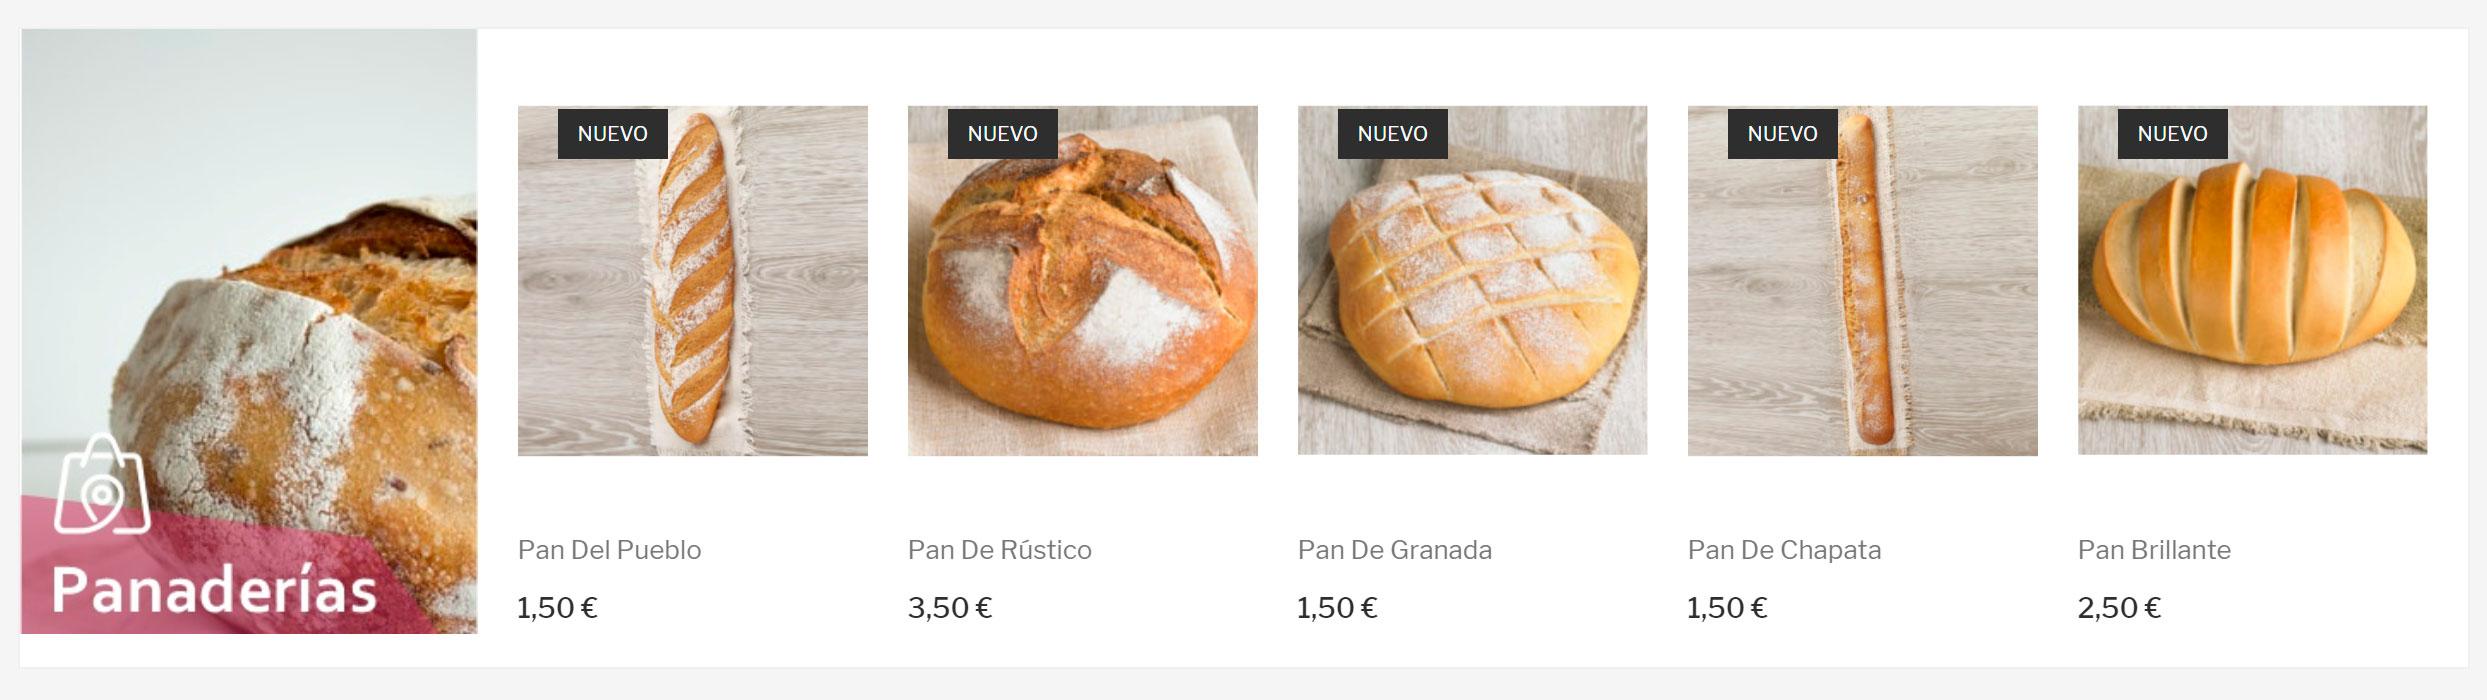 example category marketplace bakery